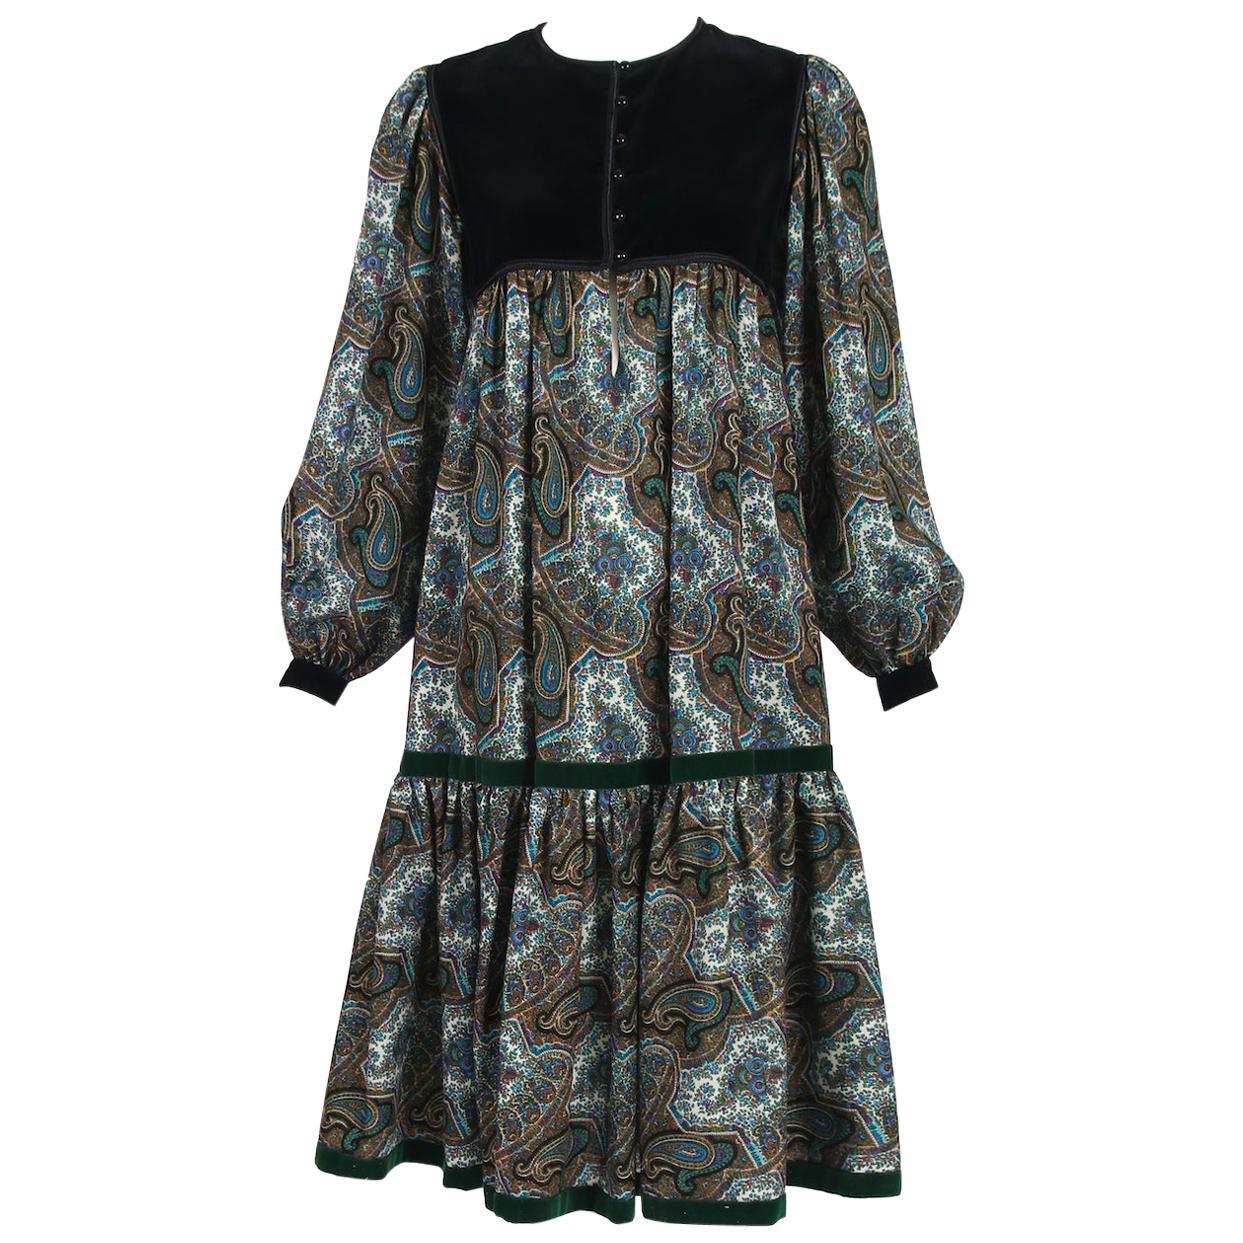 1976 Yves Saint Laurent Cossack Collection Dress